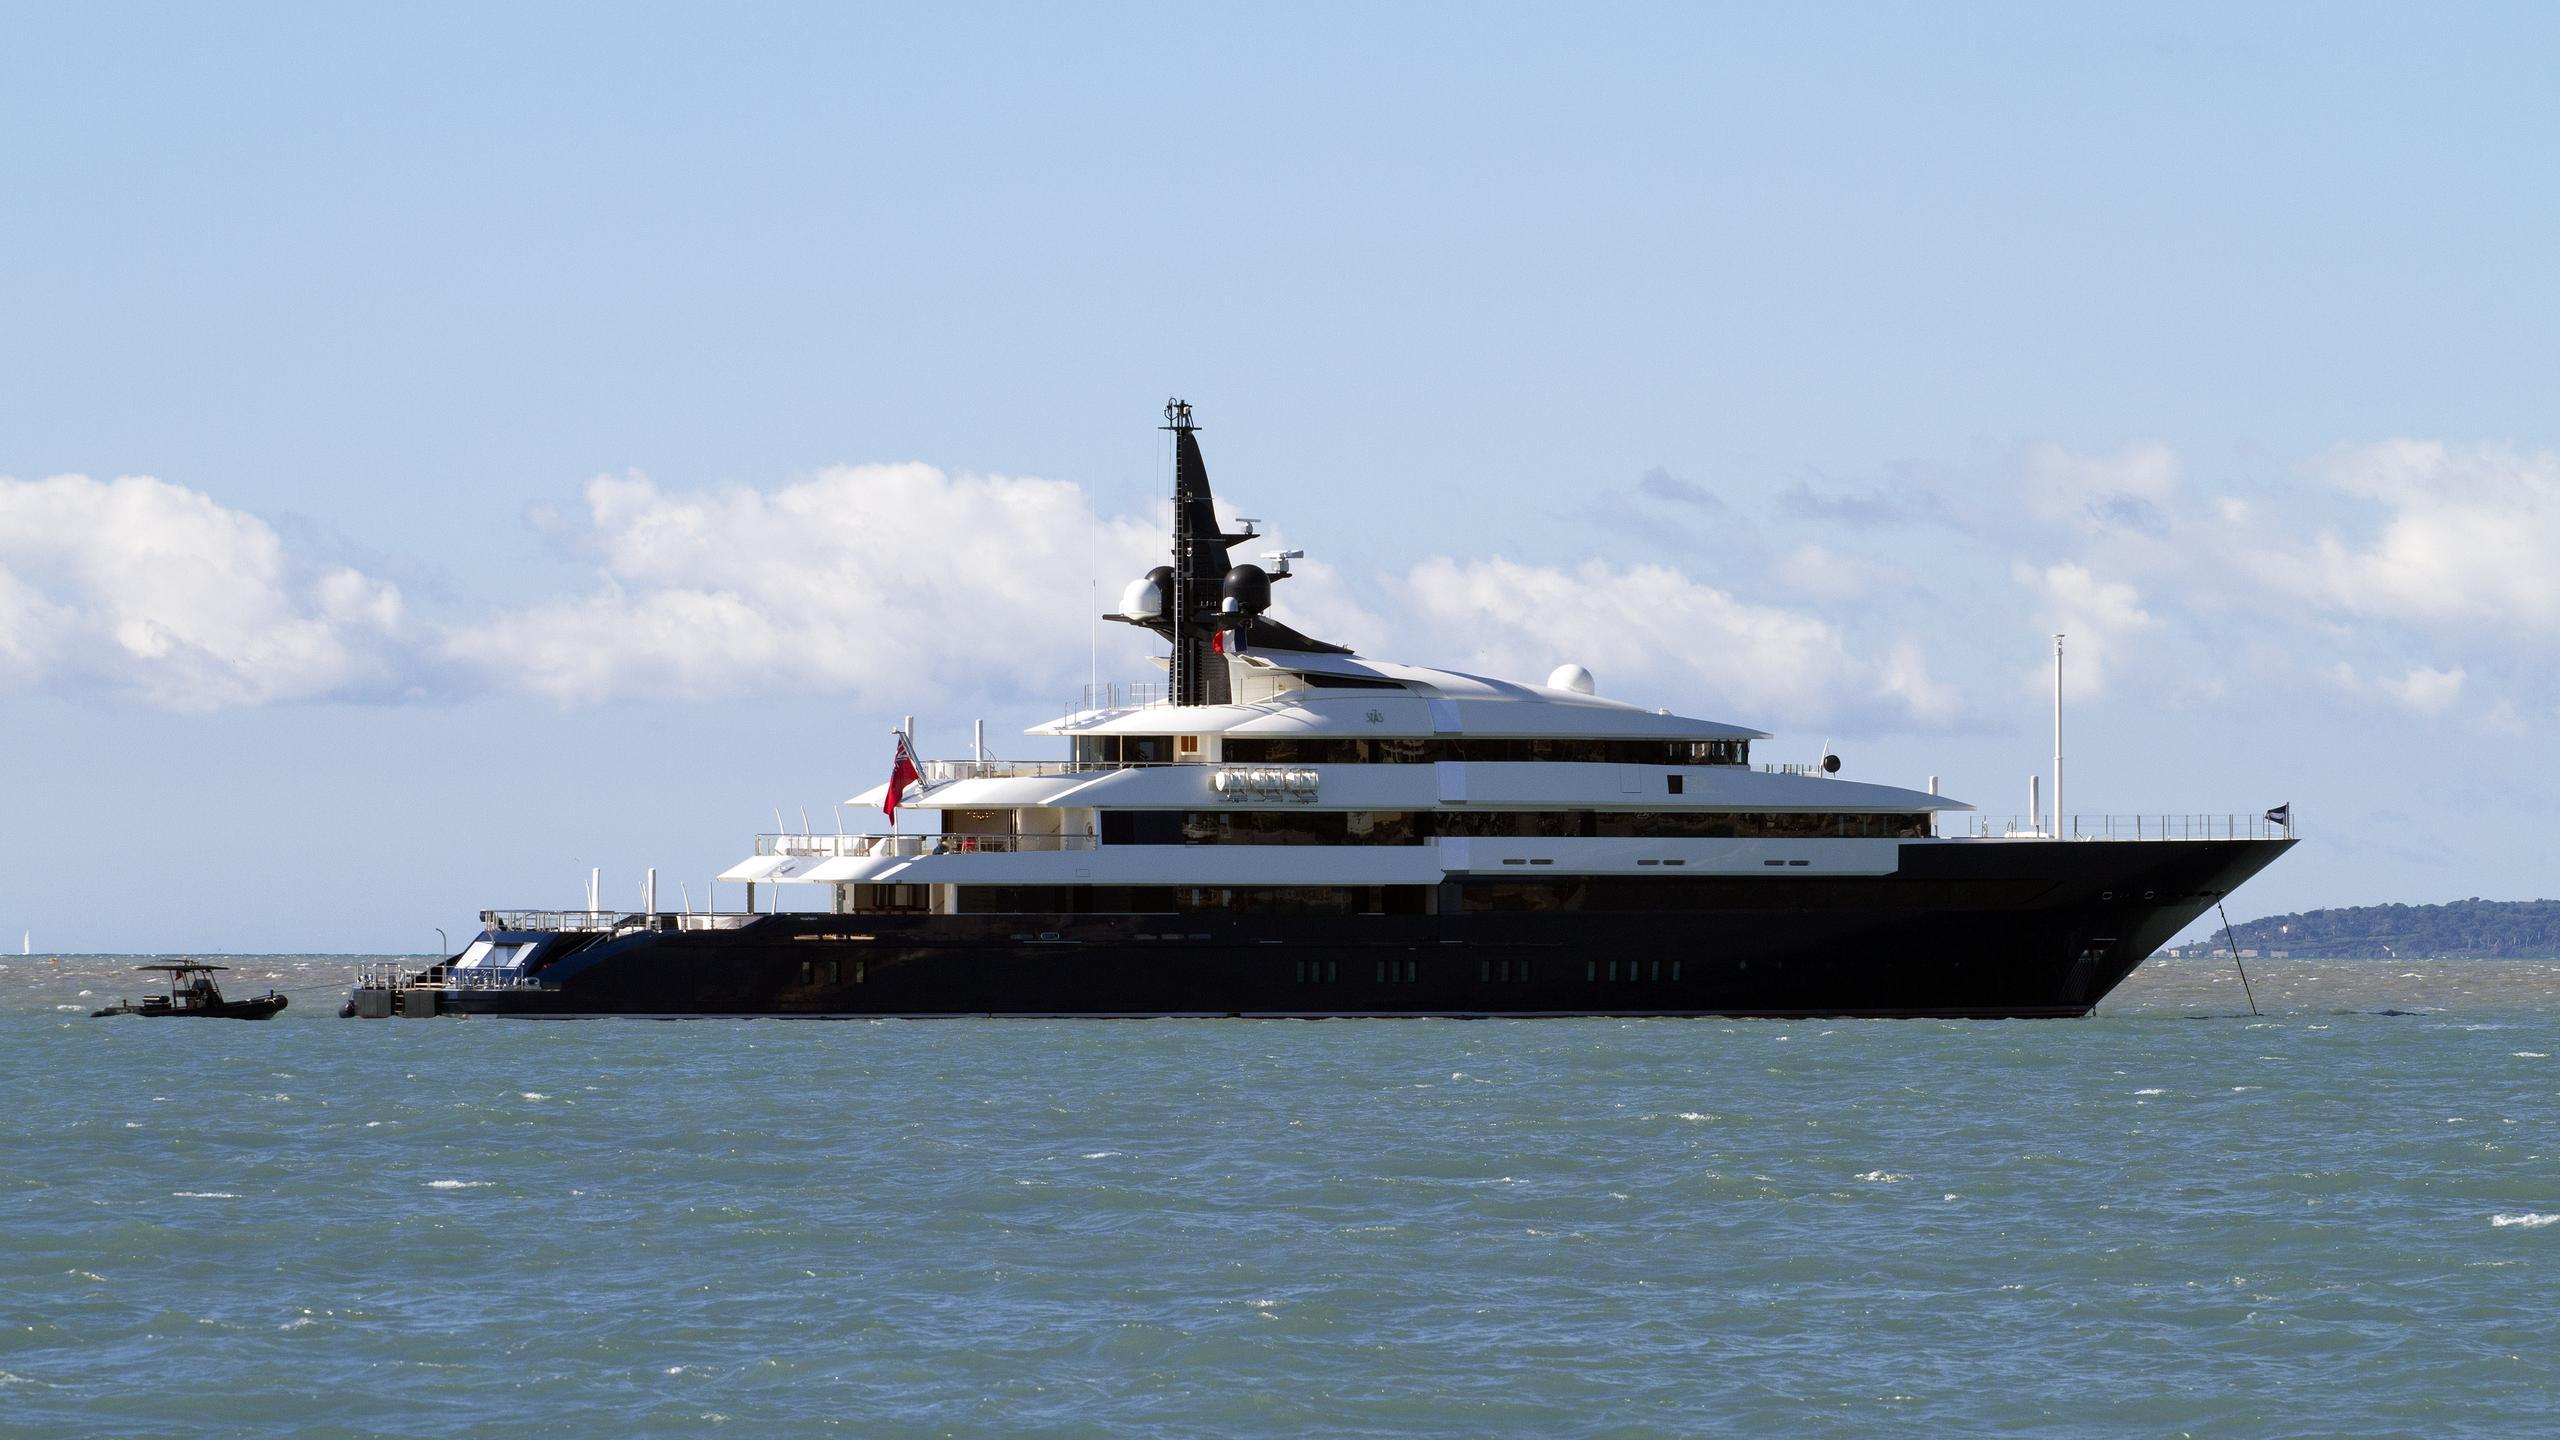 seven-seas-motor-yacht-oceanco-2010-86m-profile